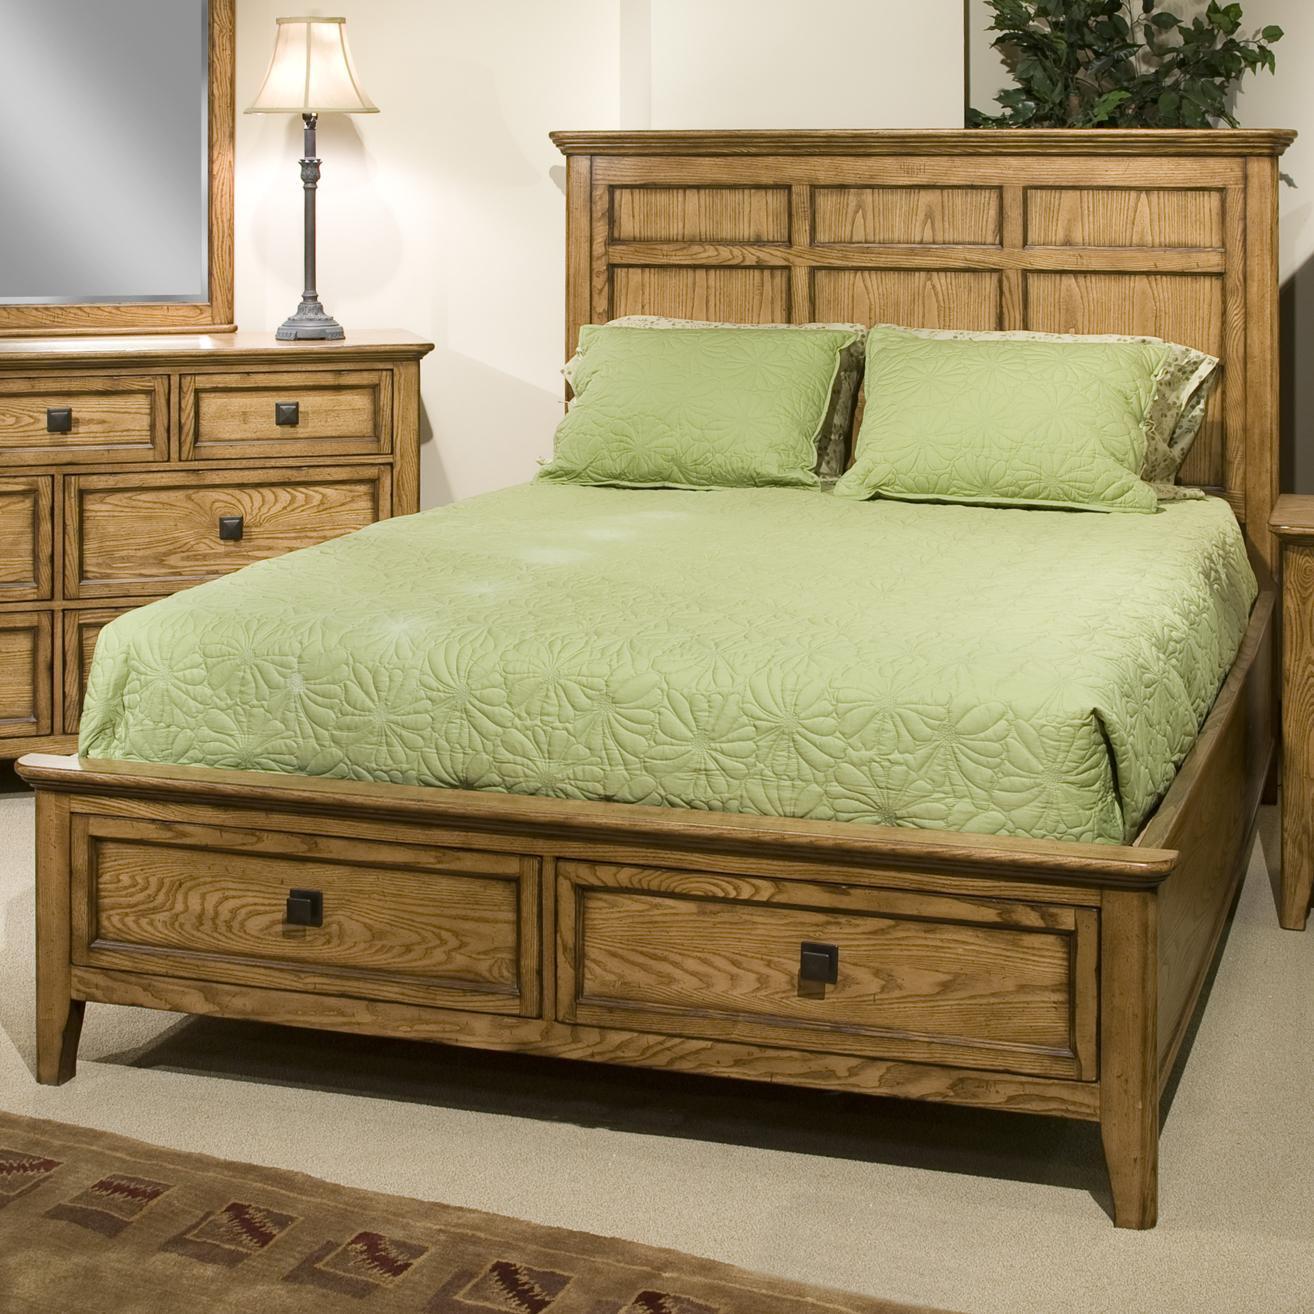 Intercon Alta Queen Storage Bed - Item Number: AL-BR-5350QS-HB+FR+RS